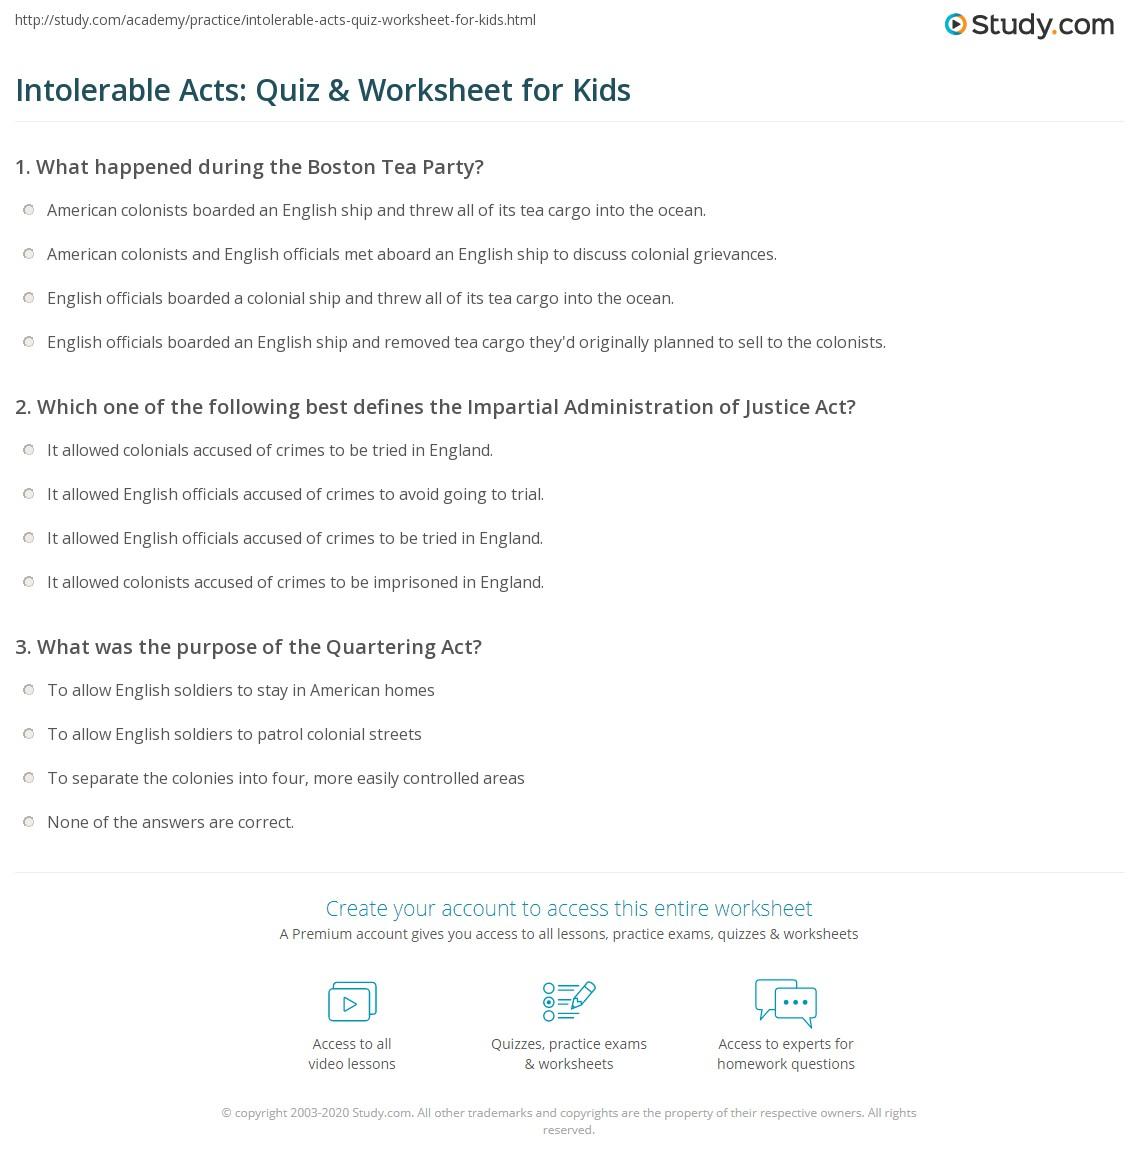 Intolerable Acts Quiz Amp Worksheet For Kids